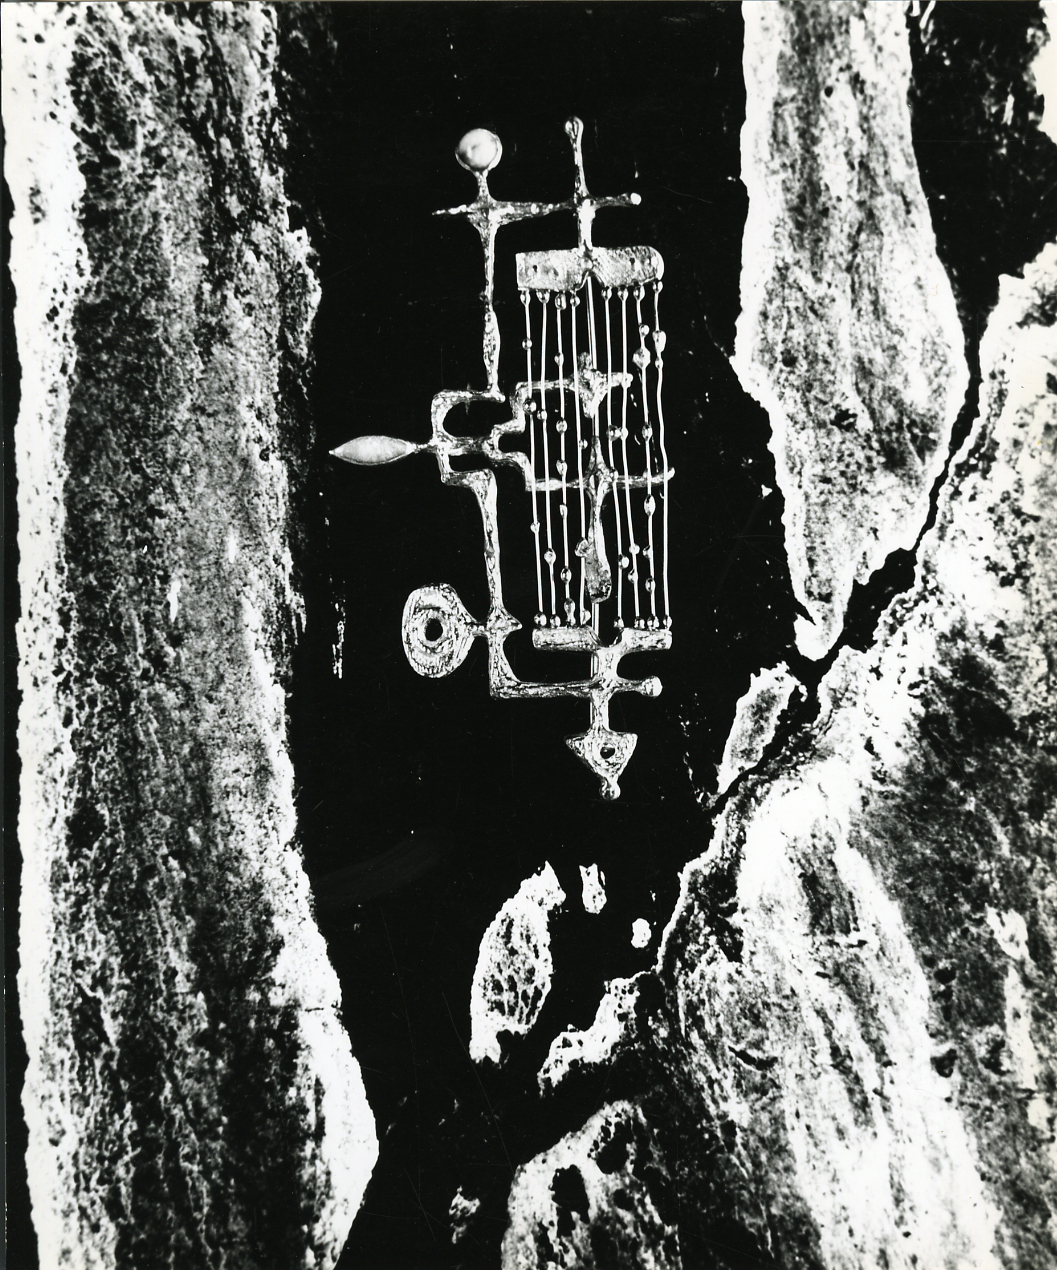 Paolo Monti, sieraad van Arnaldo Pomodoro, 1960